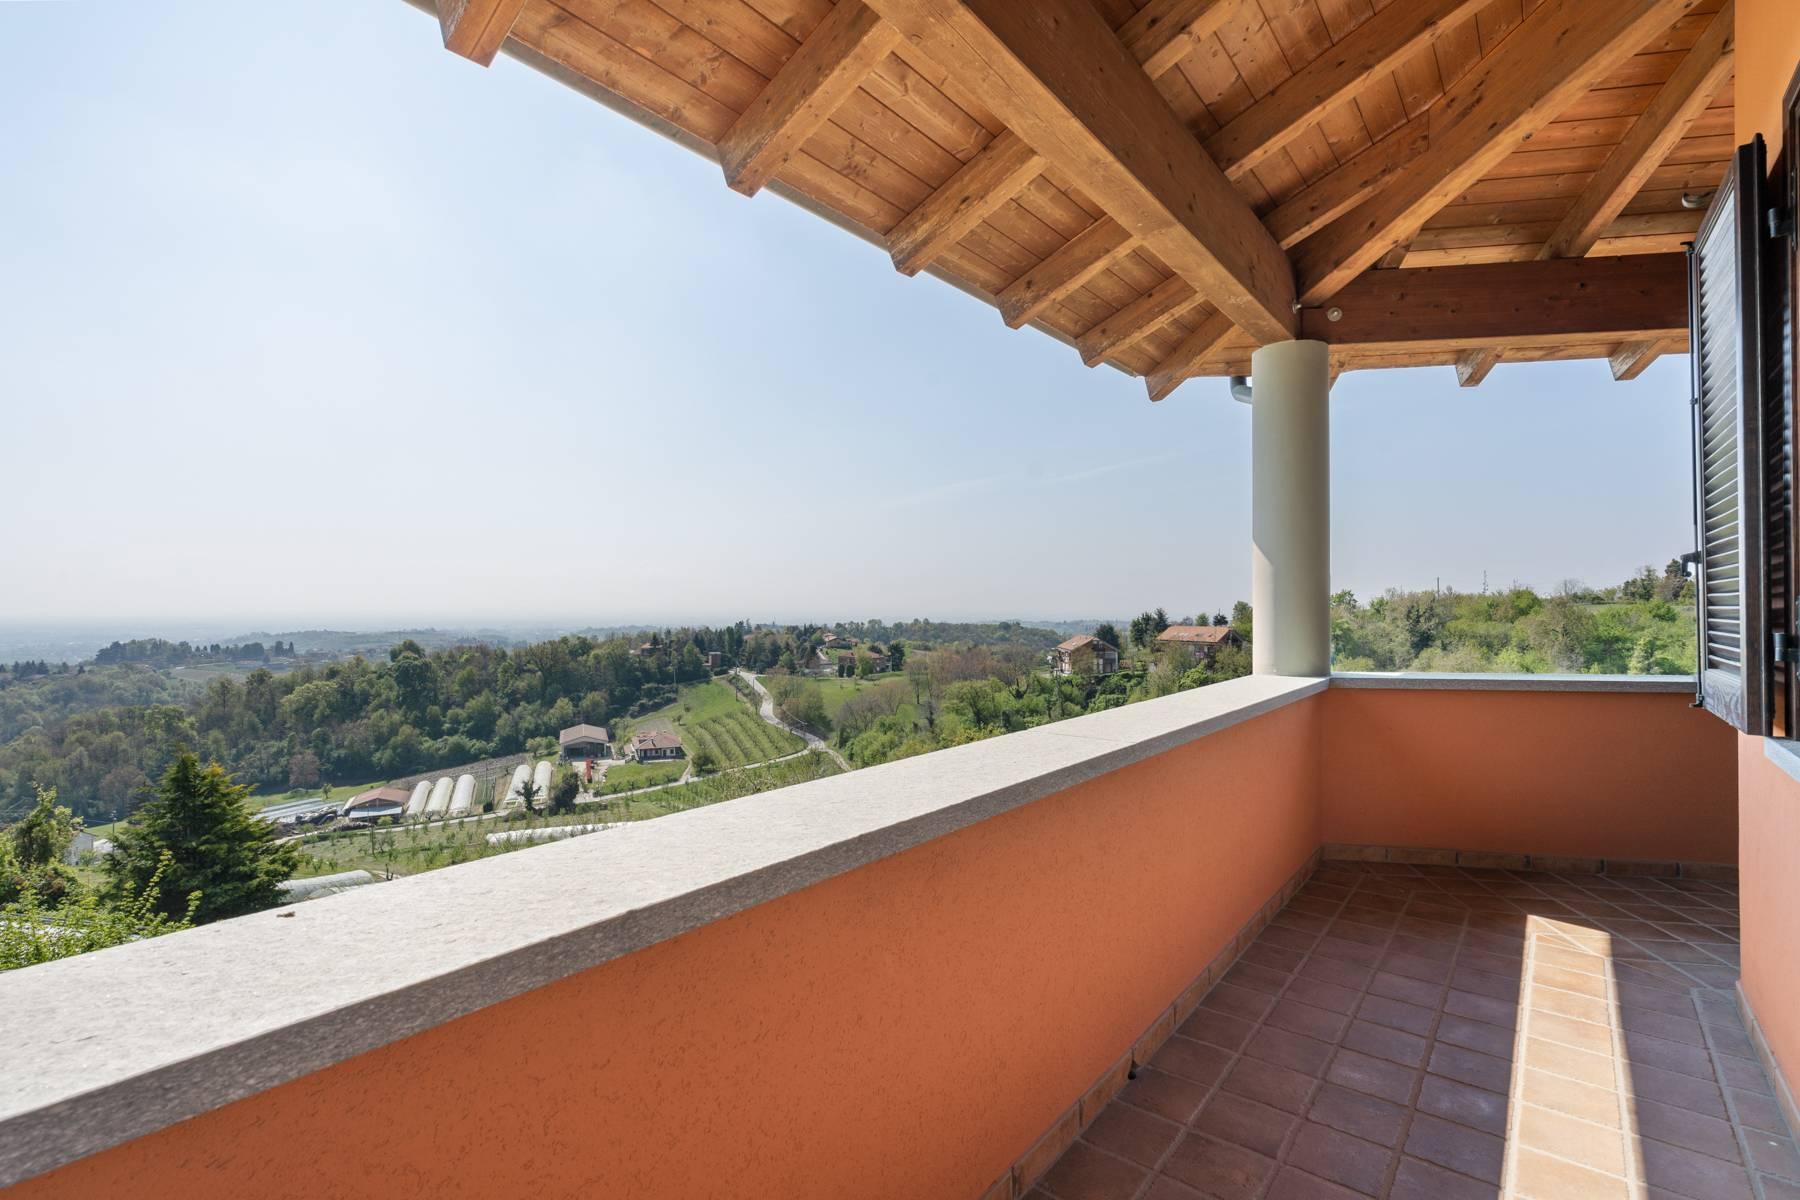 Villa in Vendita a Baldissero Torinese: 5 locali, 503 mq - Foto 13